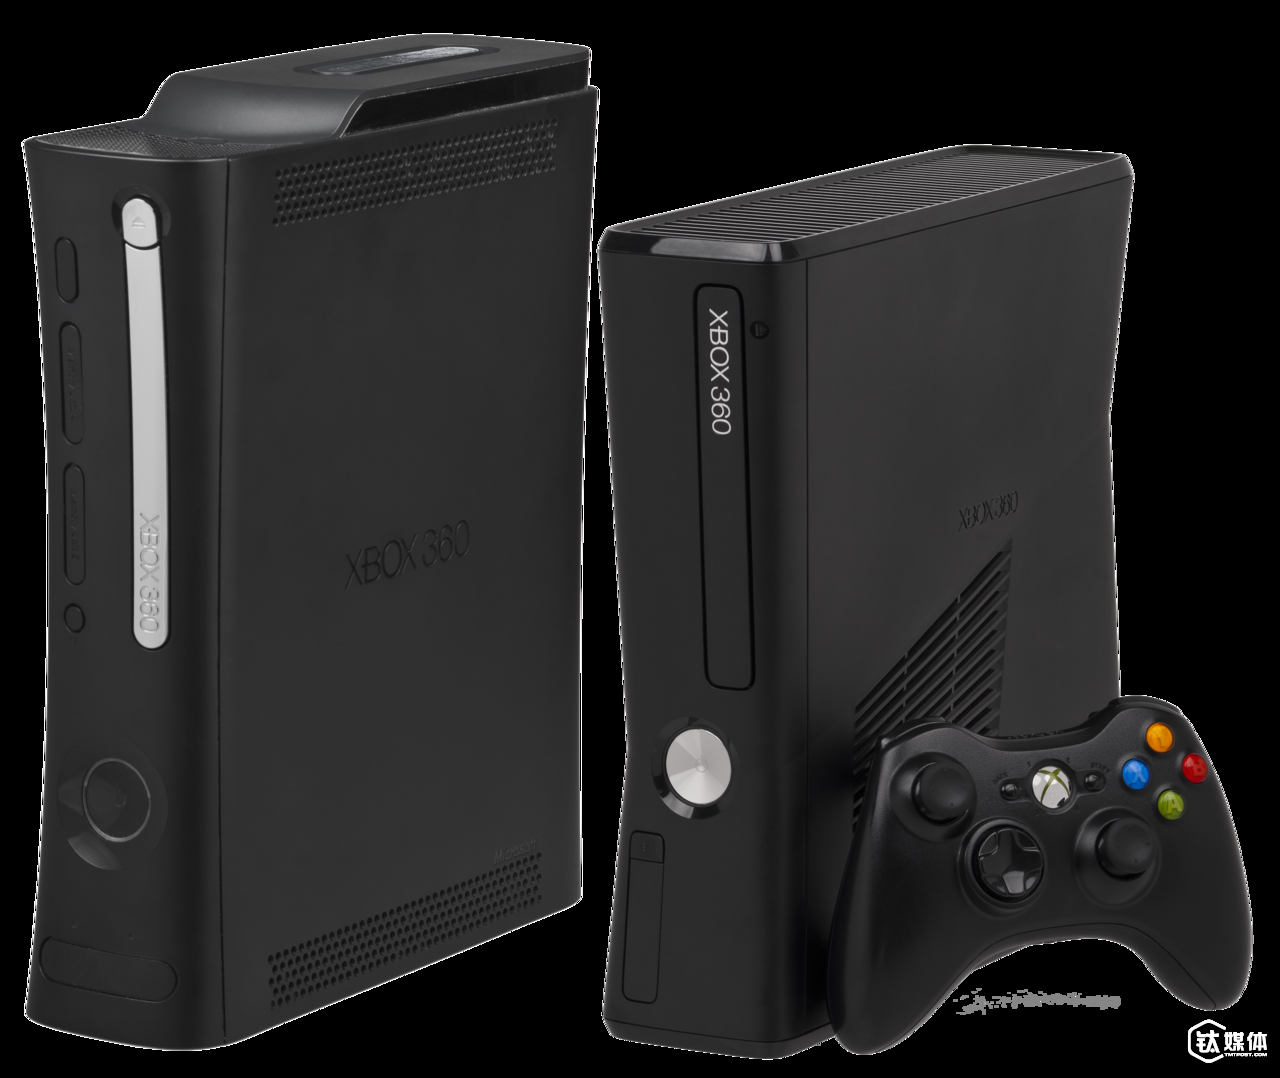 左边为 Xbox 360精英版,右边为 Xbox 360 S Evan-Amos